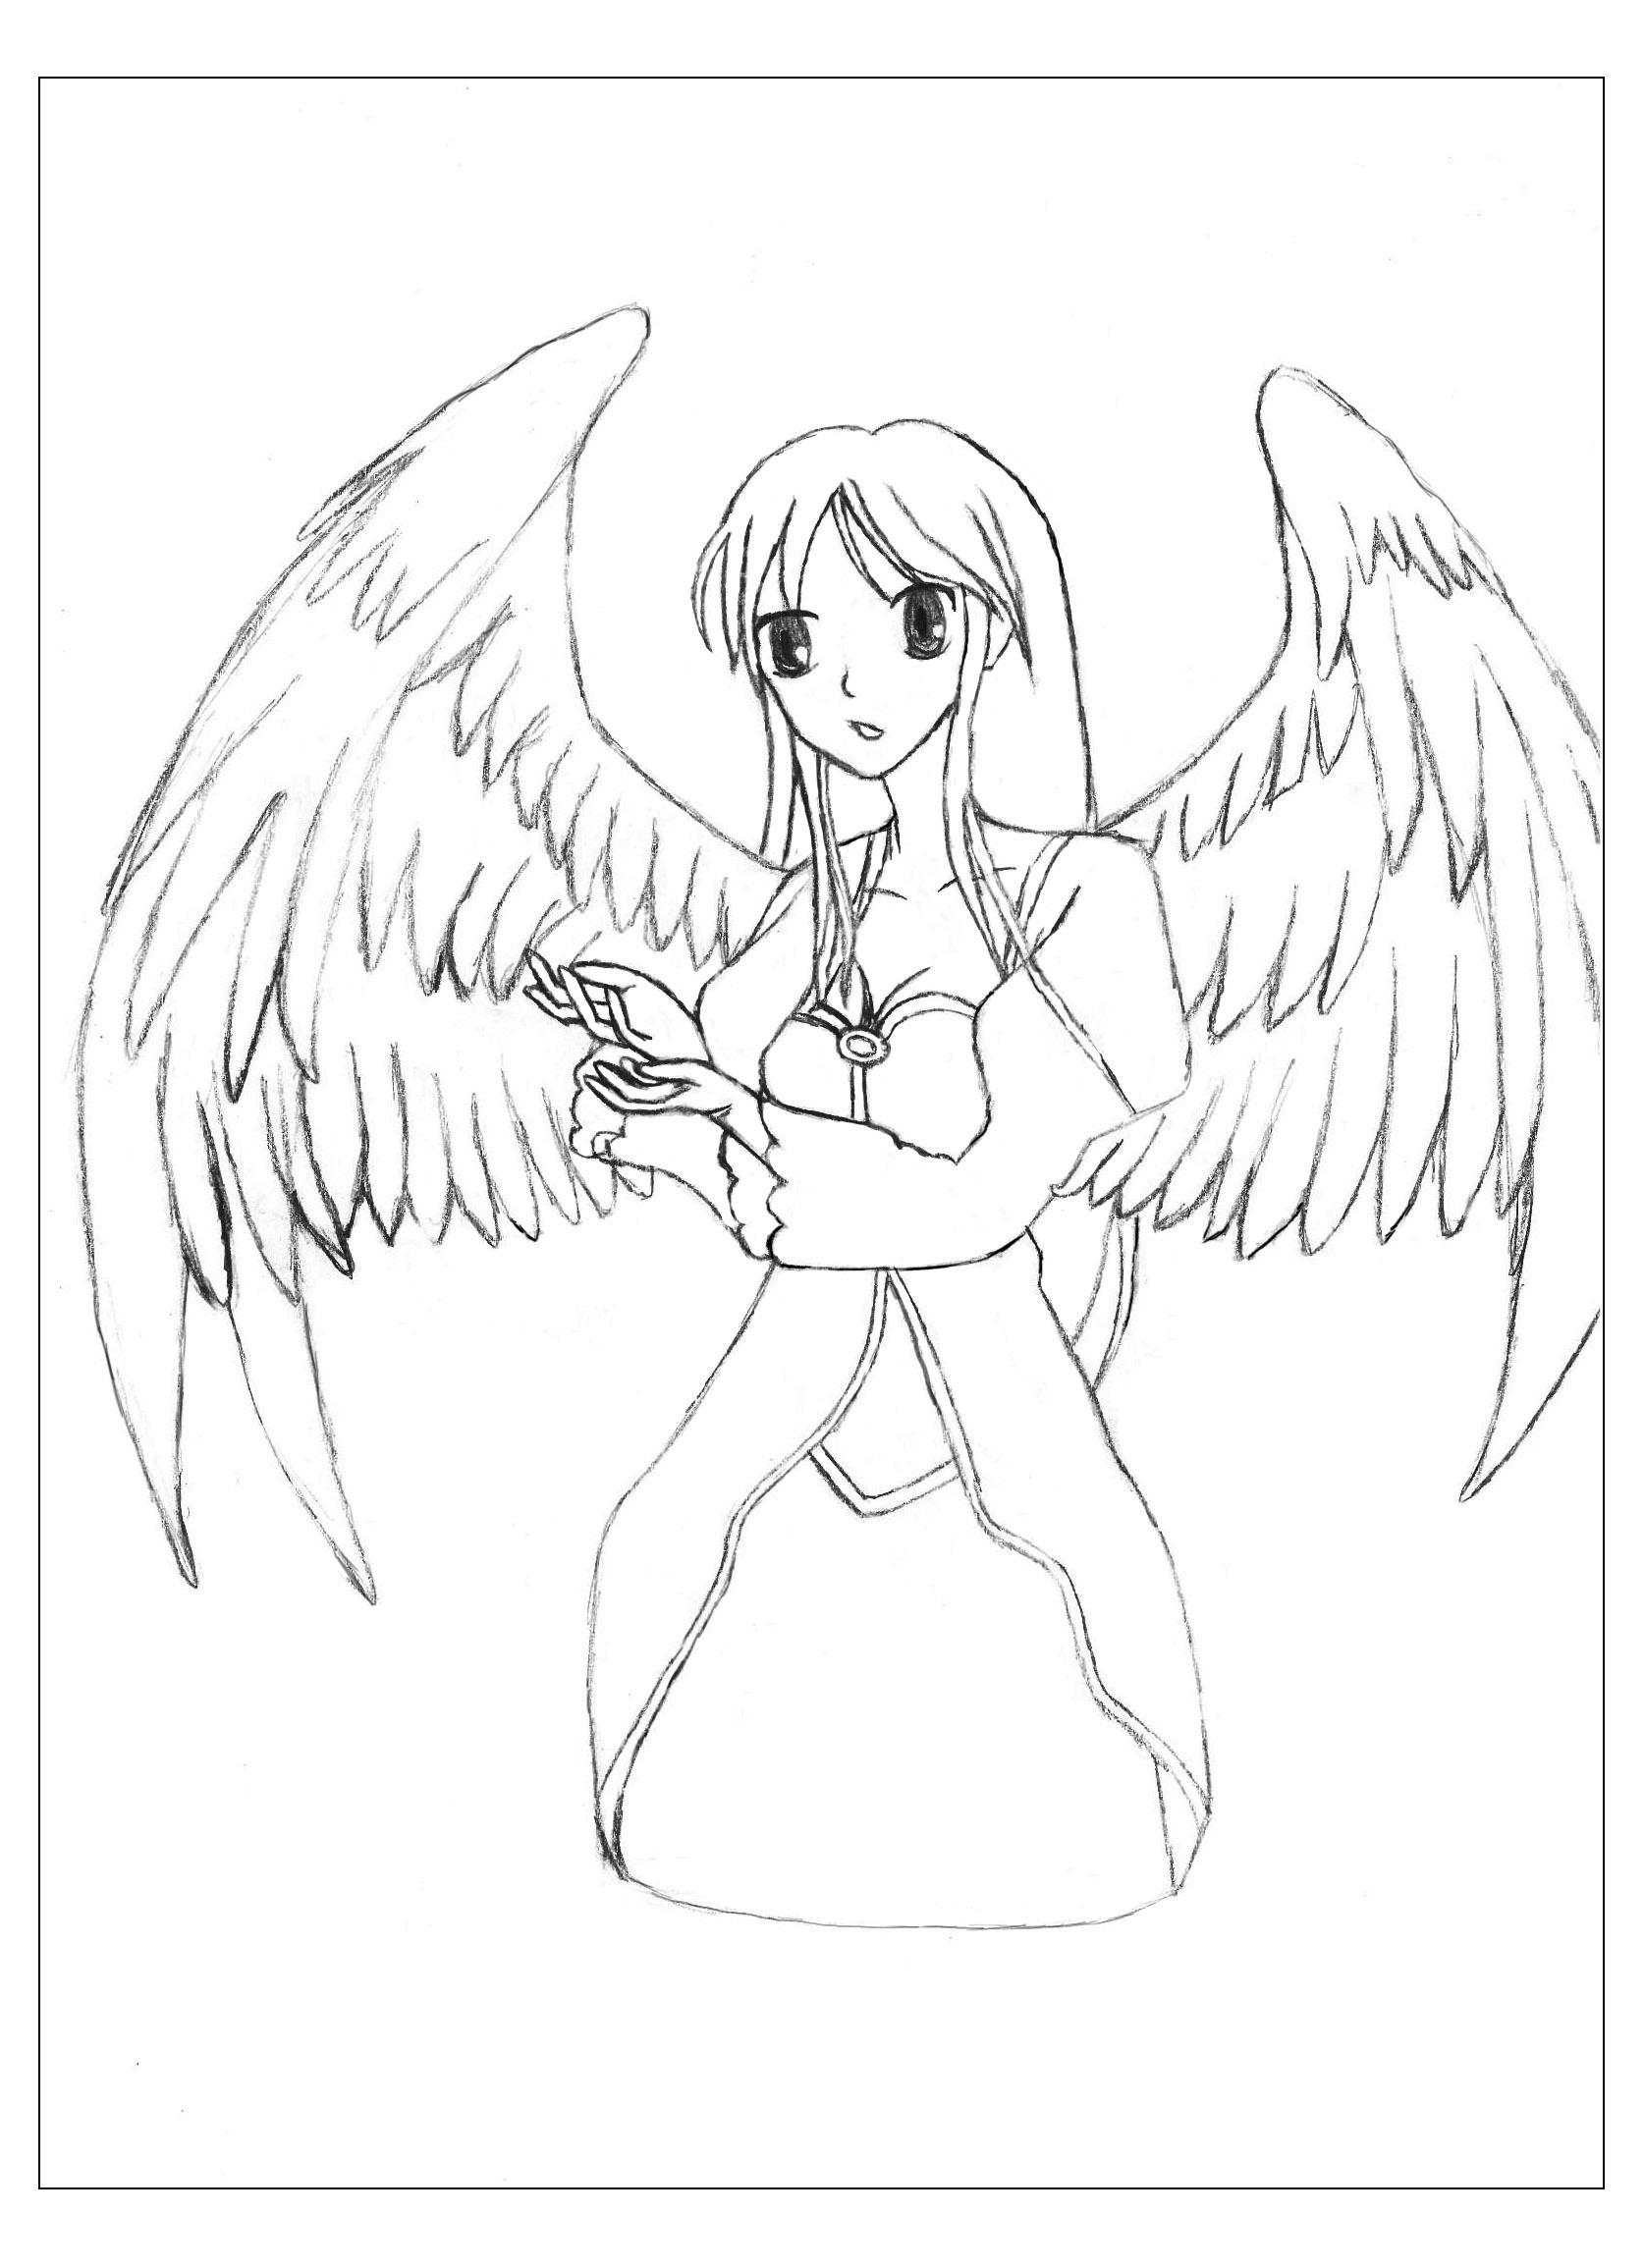 Manga Ange - Mangas / Animés - Coloriages Difficiles Pour à Coloriage Manga Kawaii